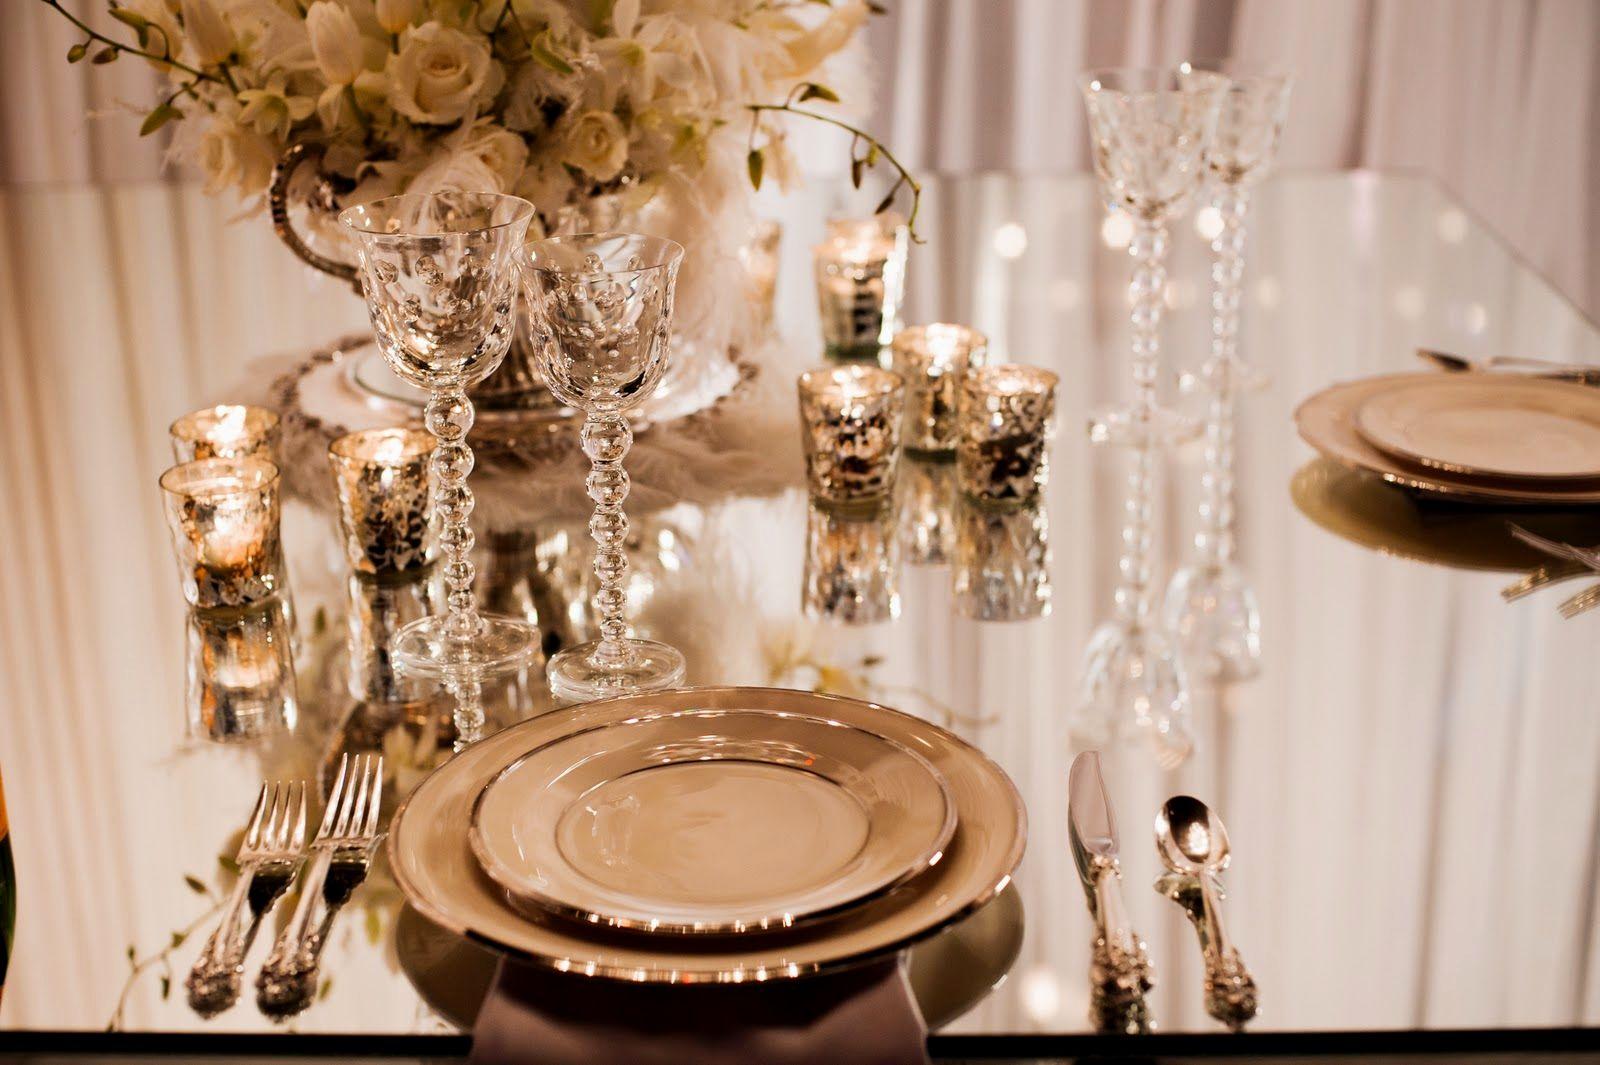 vintage themed wedding decor vintage party decoration wedding - مهمانی عالی برای پاگشا تازه عروس و داماد ها